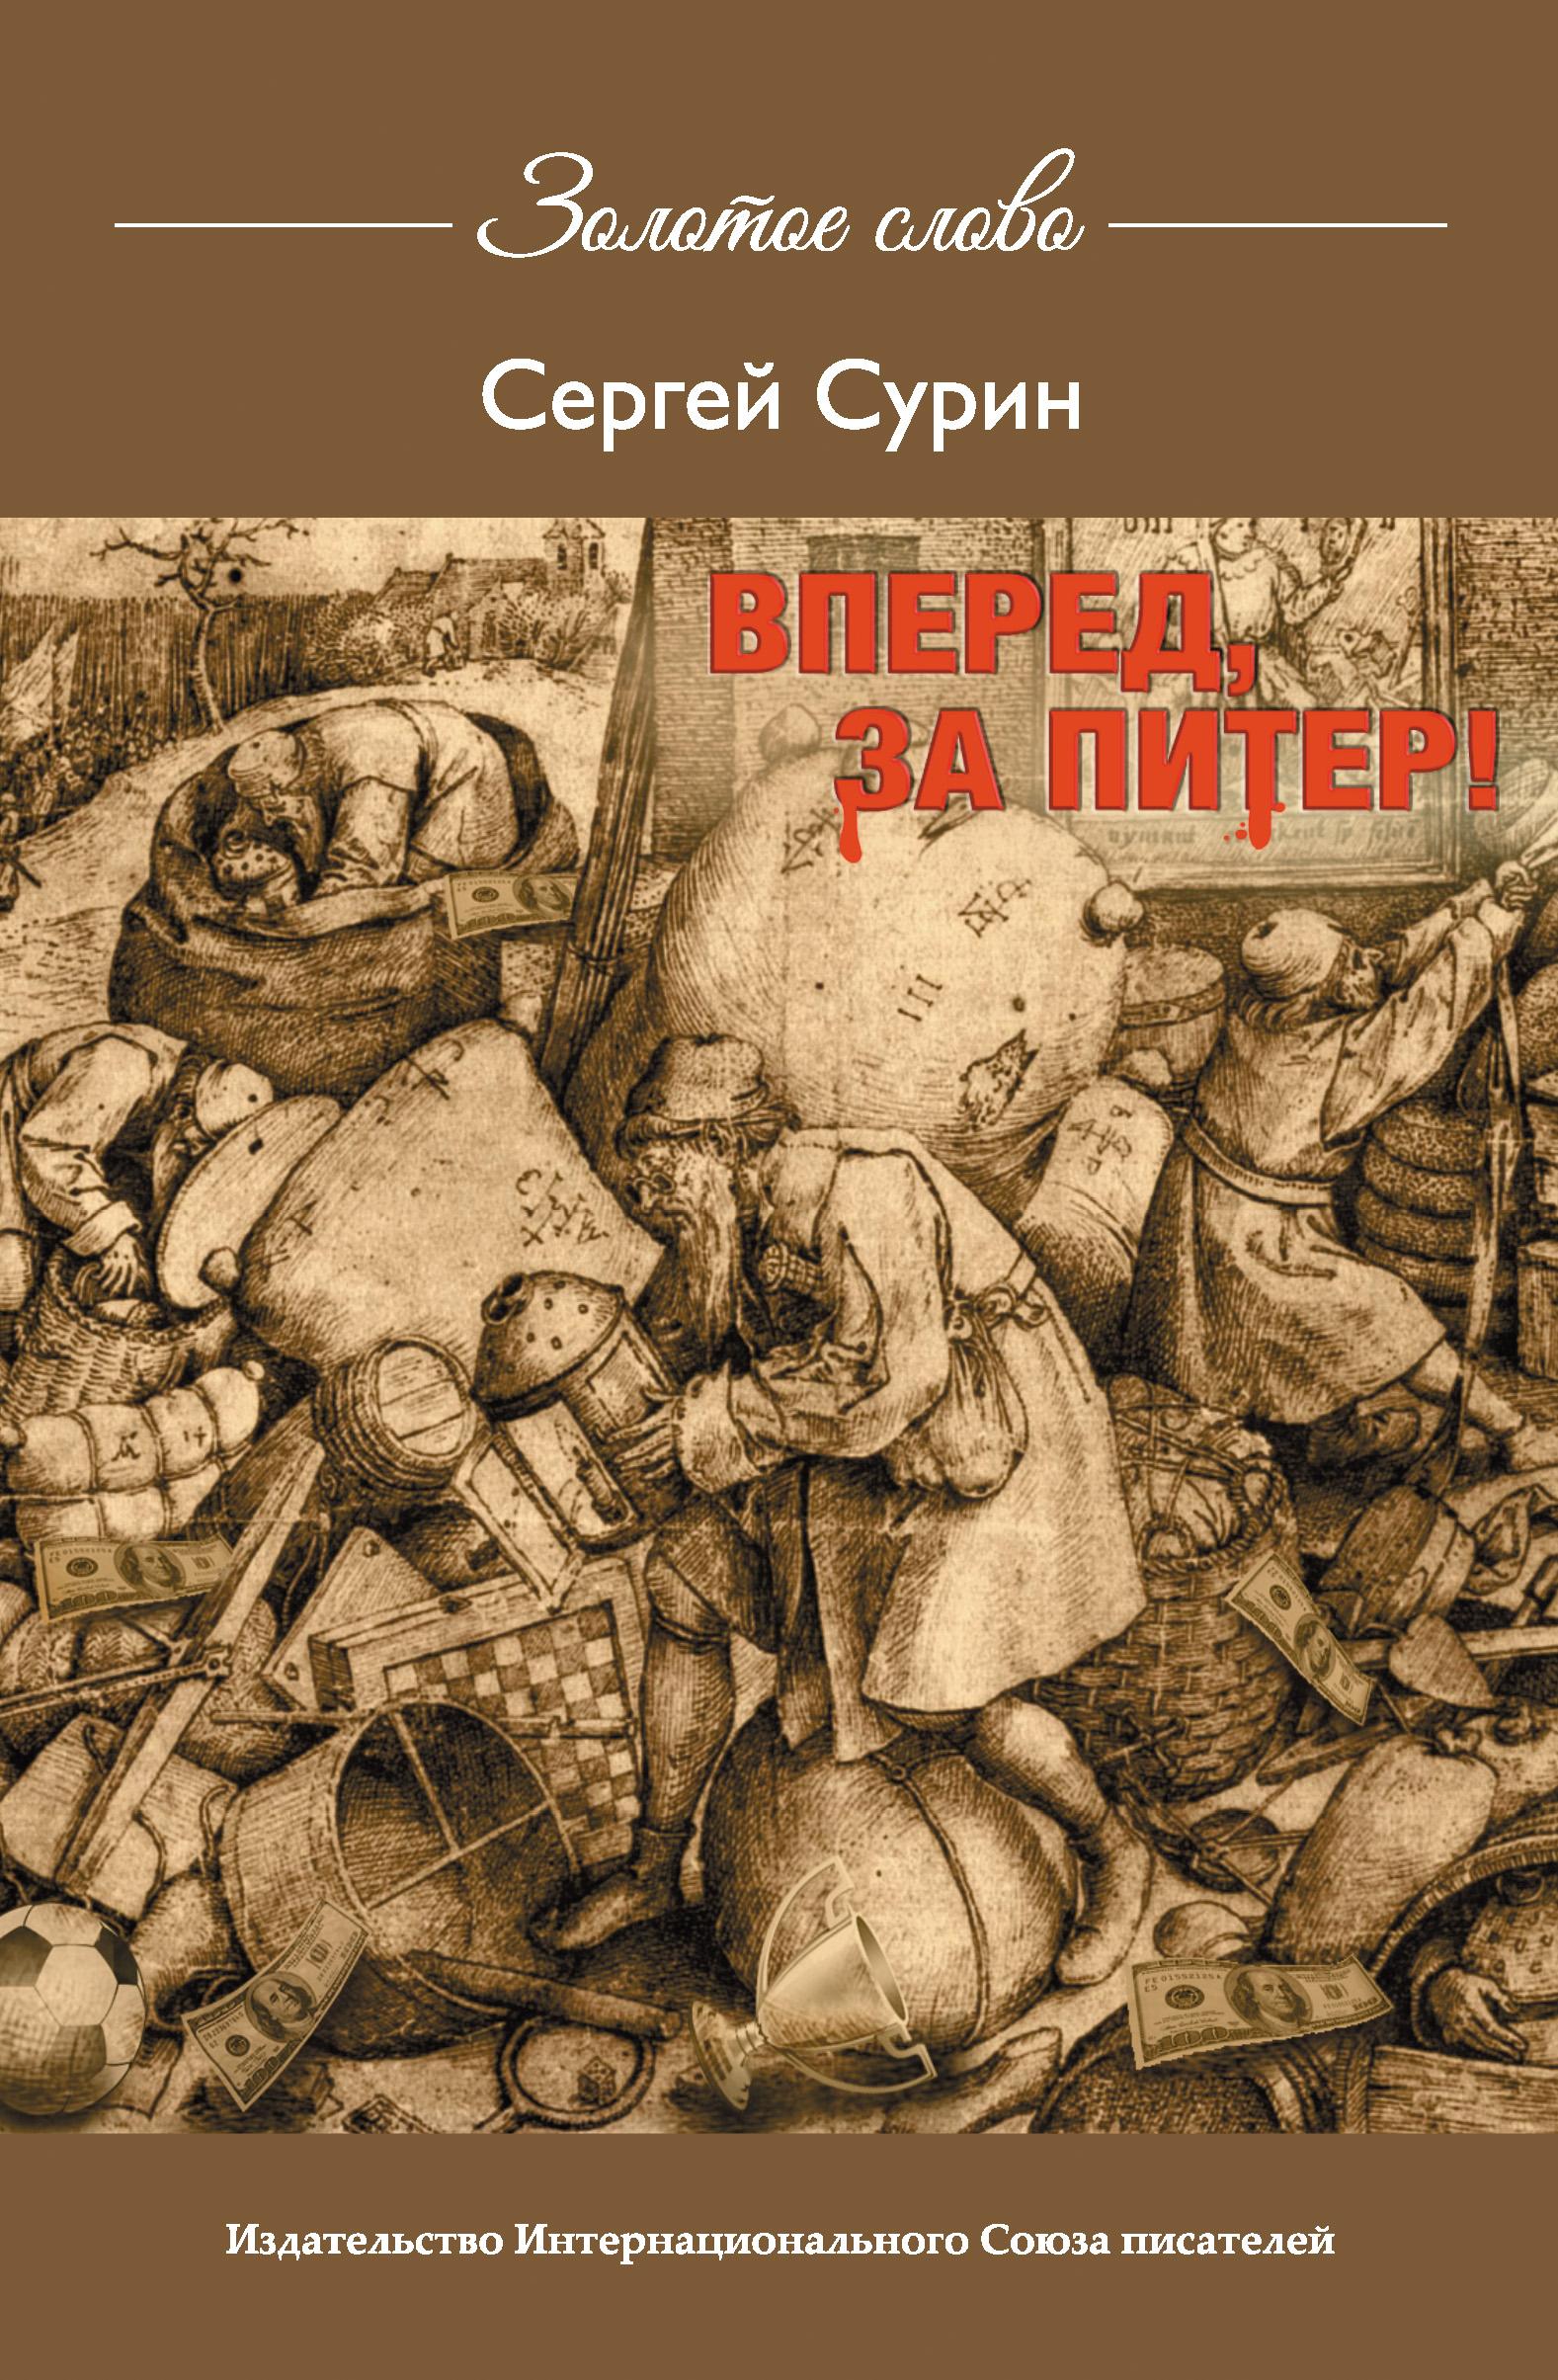 Купить книгу Вперед, за Питер!, автора Сергея Сурина